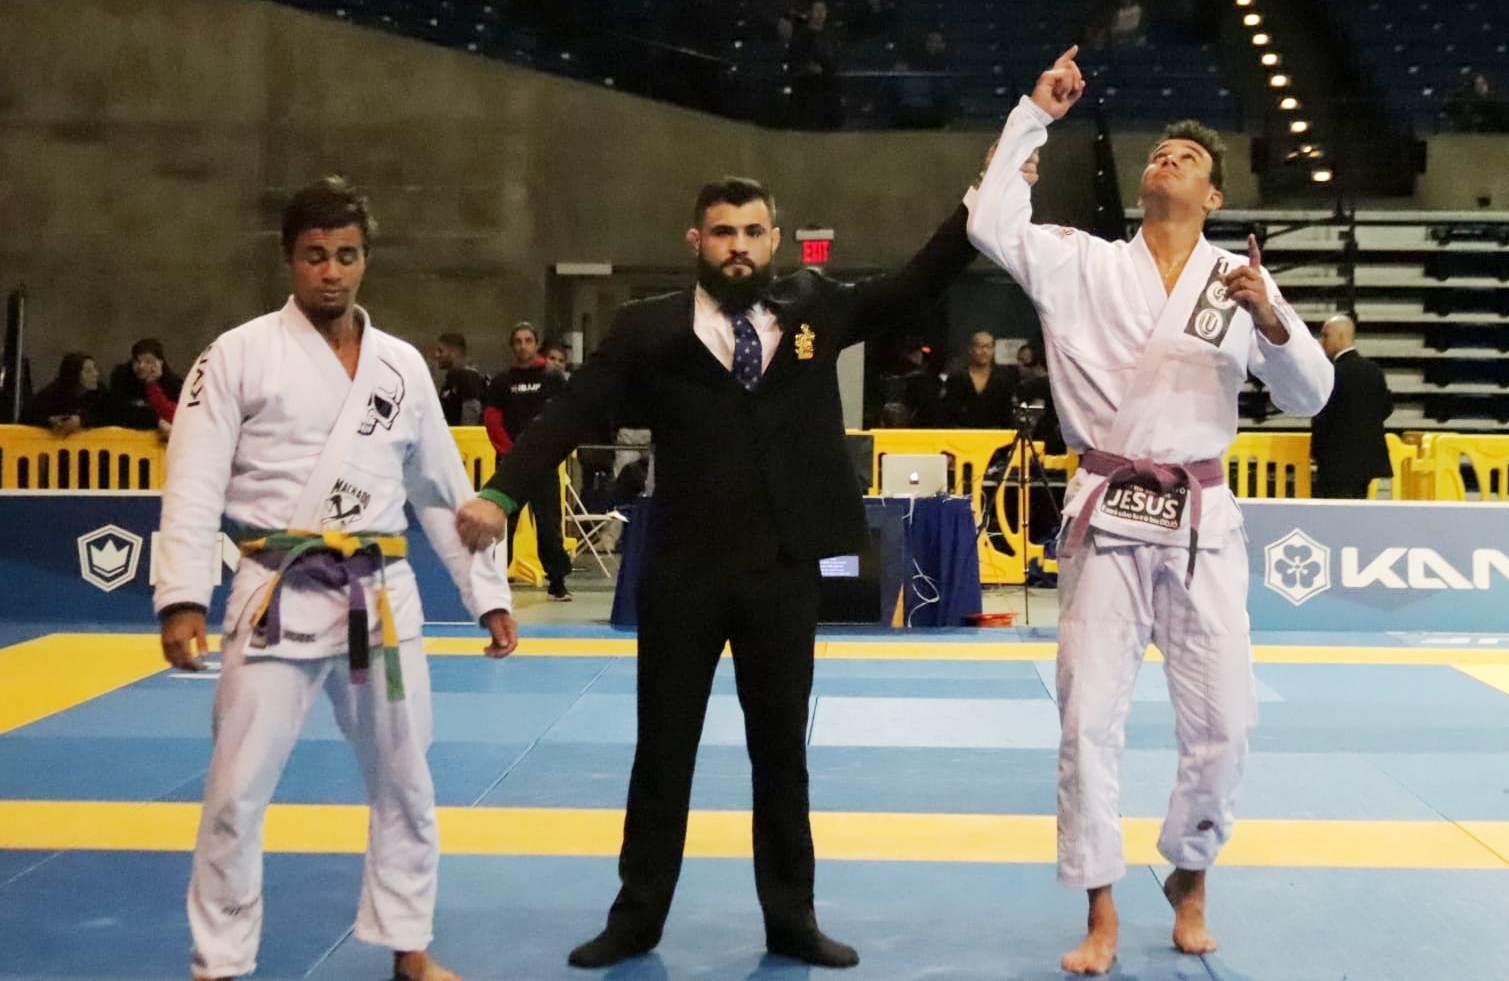 Erich Muniz wins purple belt absolute on day 1 of the 2019